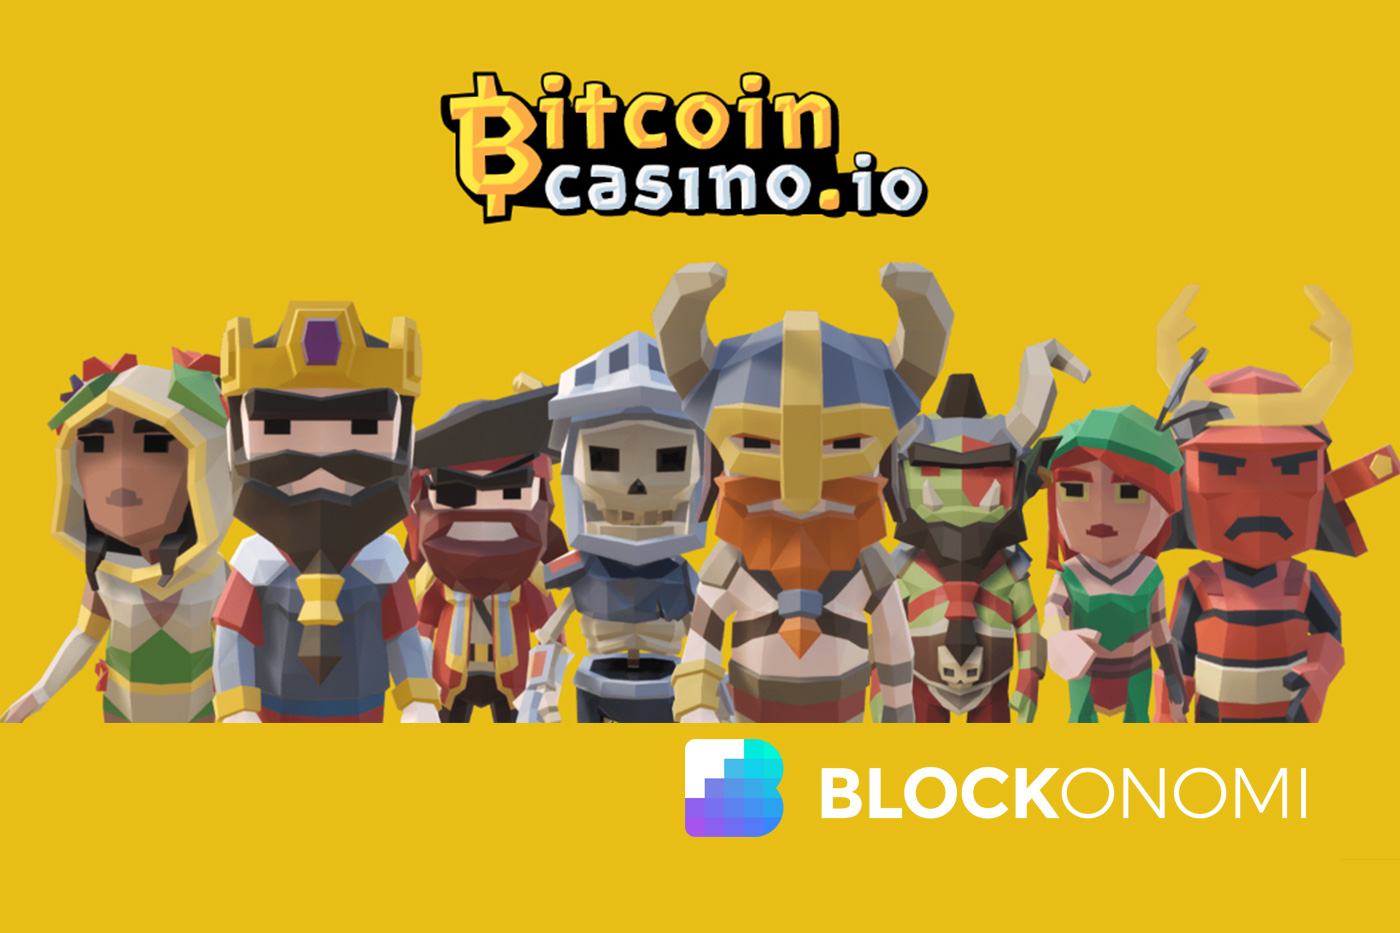 Best new online casinos 2020